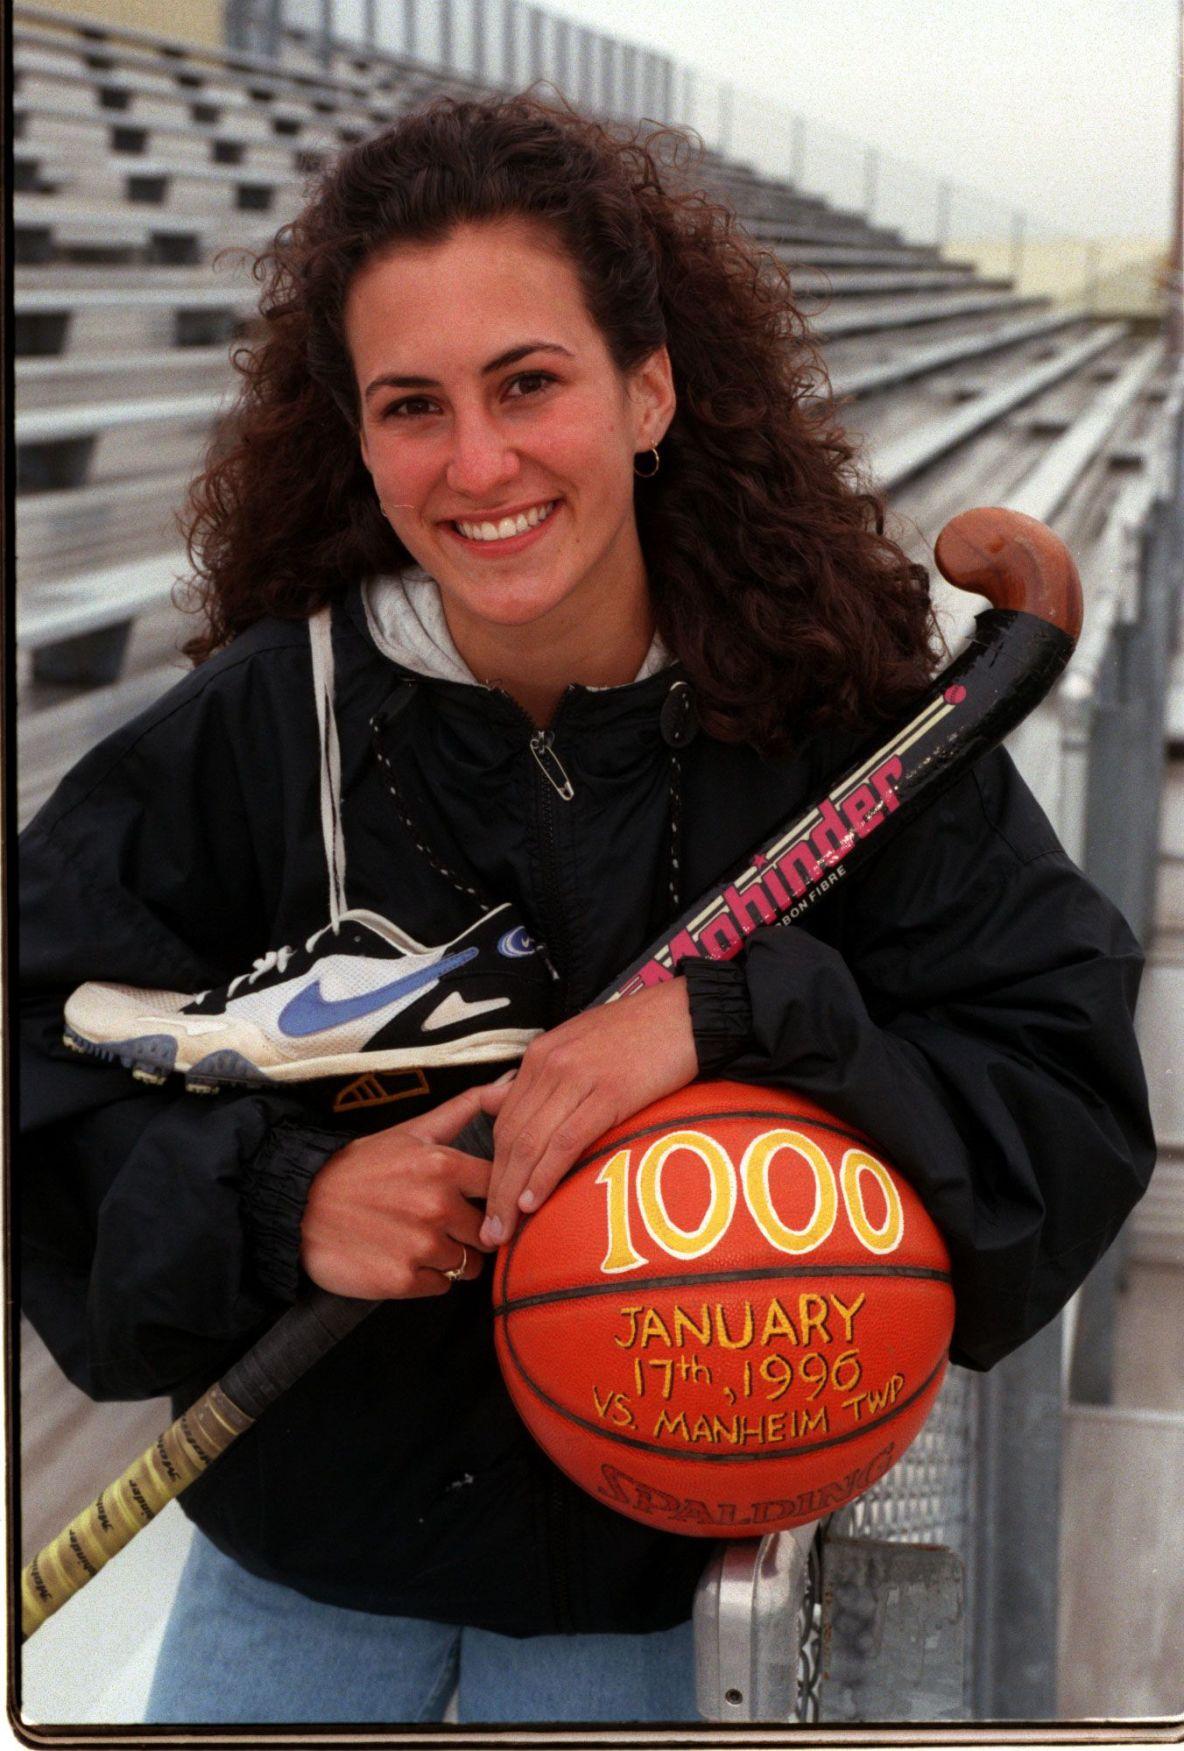 LoriHouck 1996 new Era athlete photo.jpg